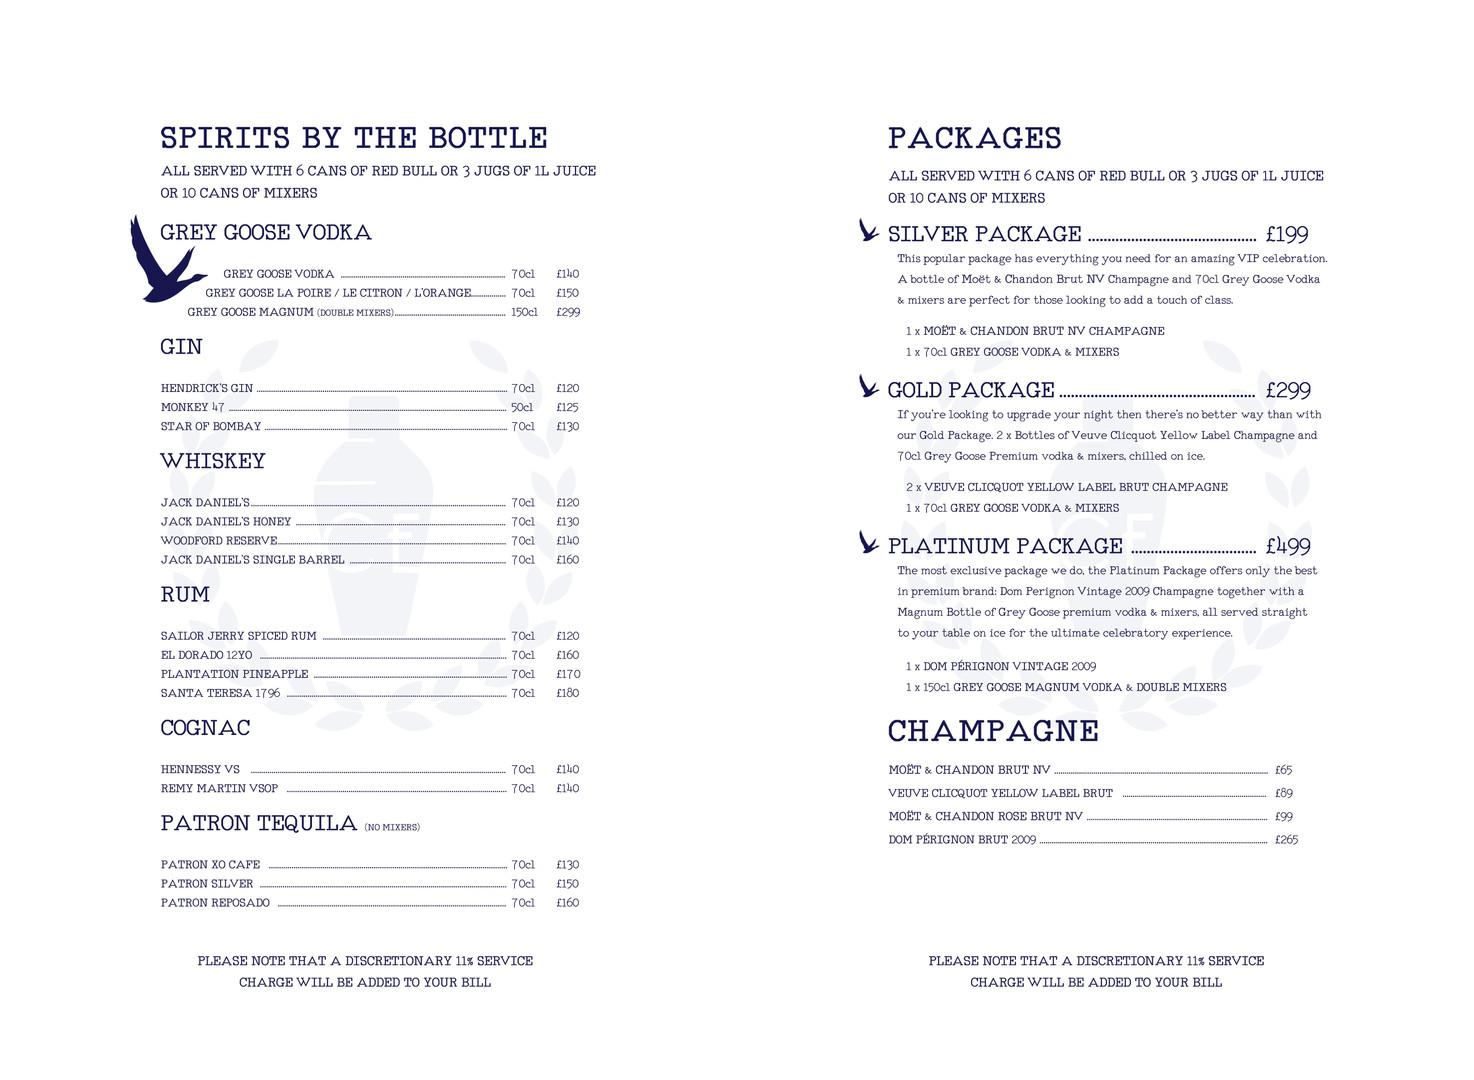 VIP Packages & Bottles